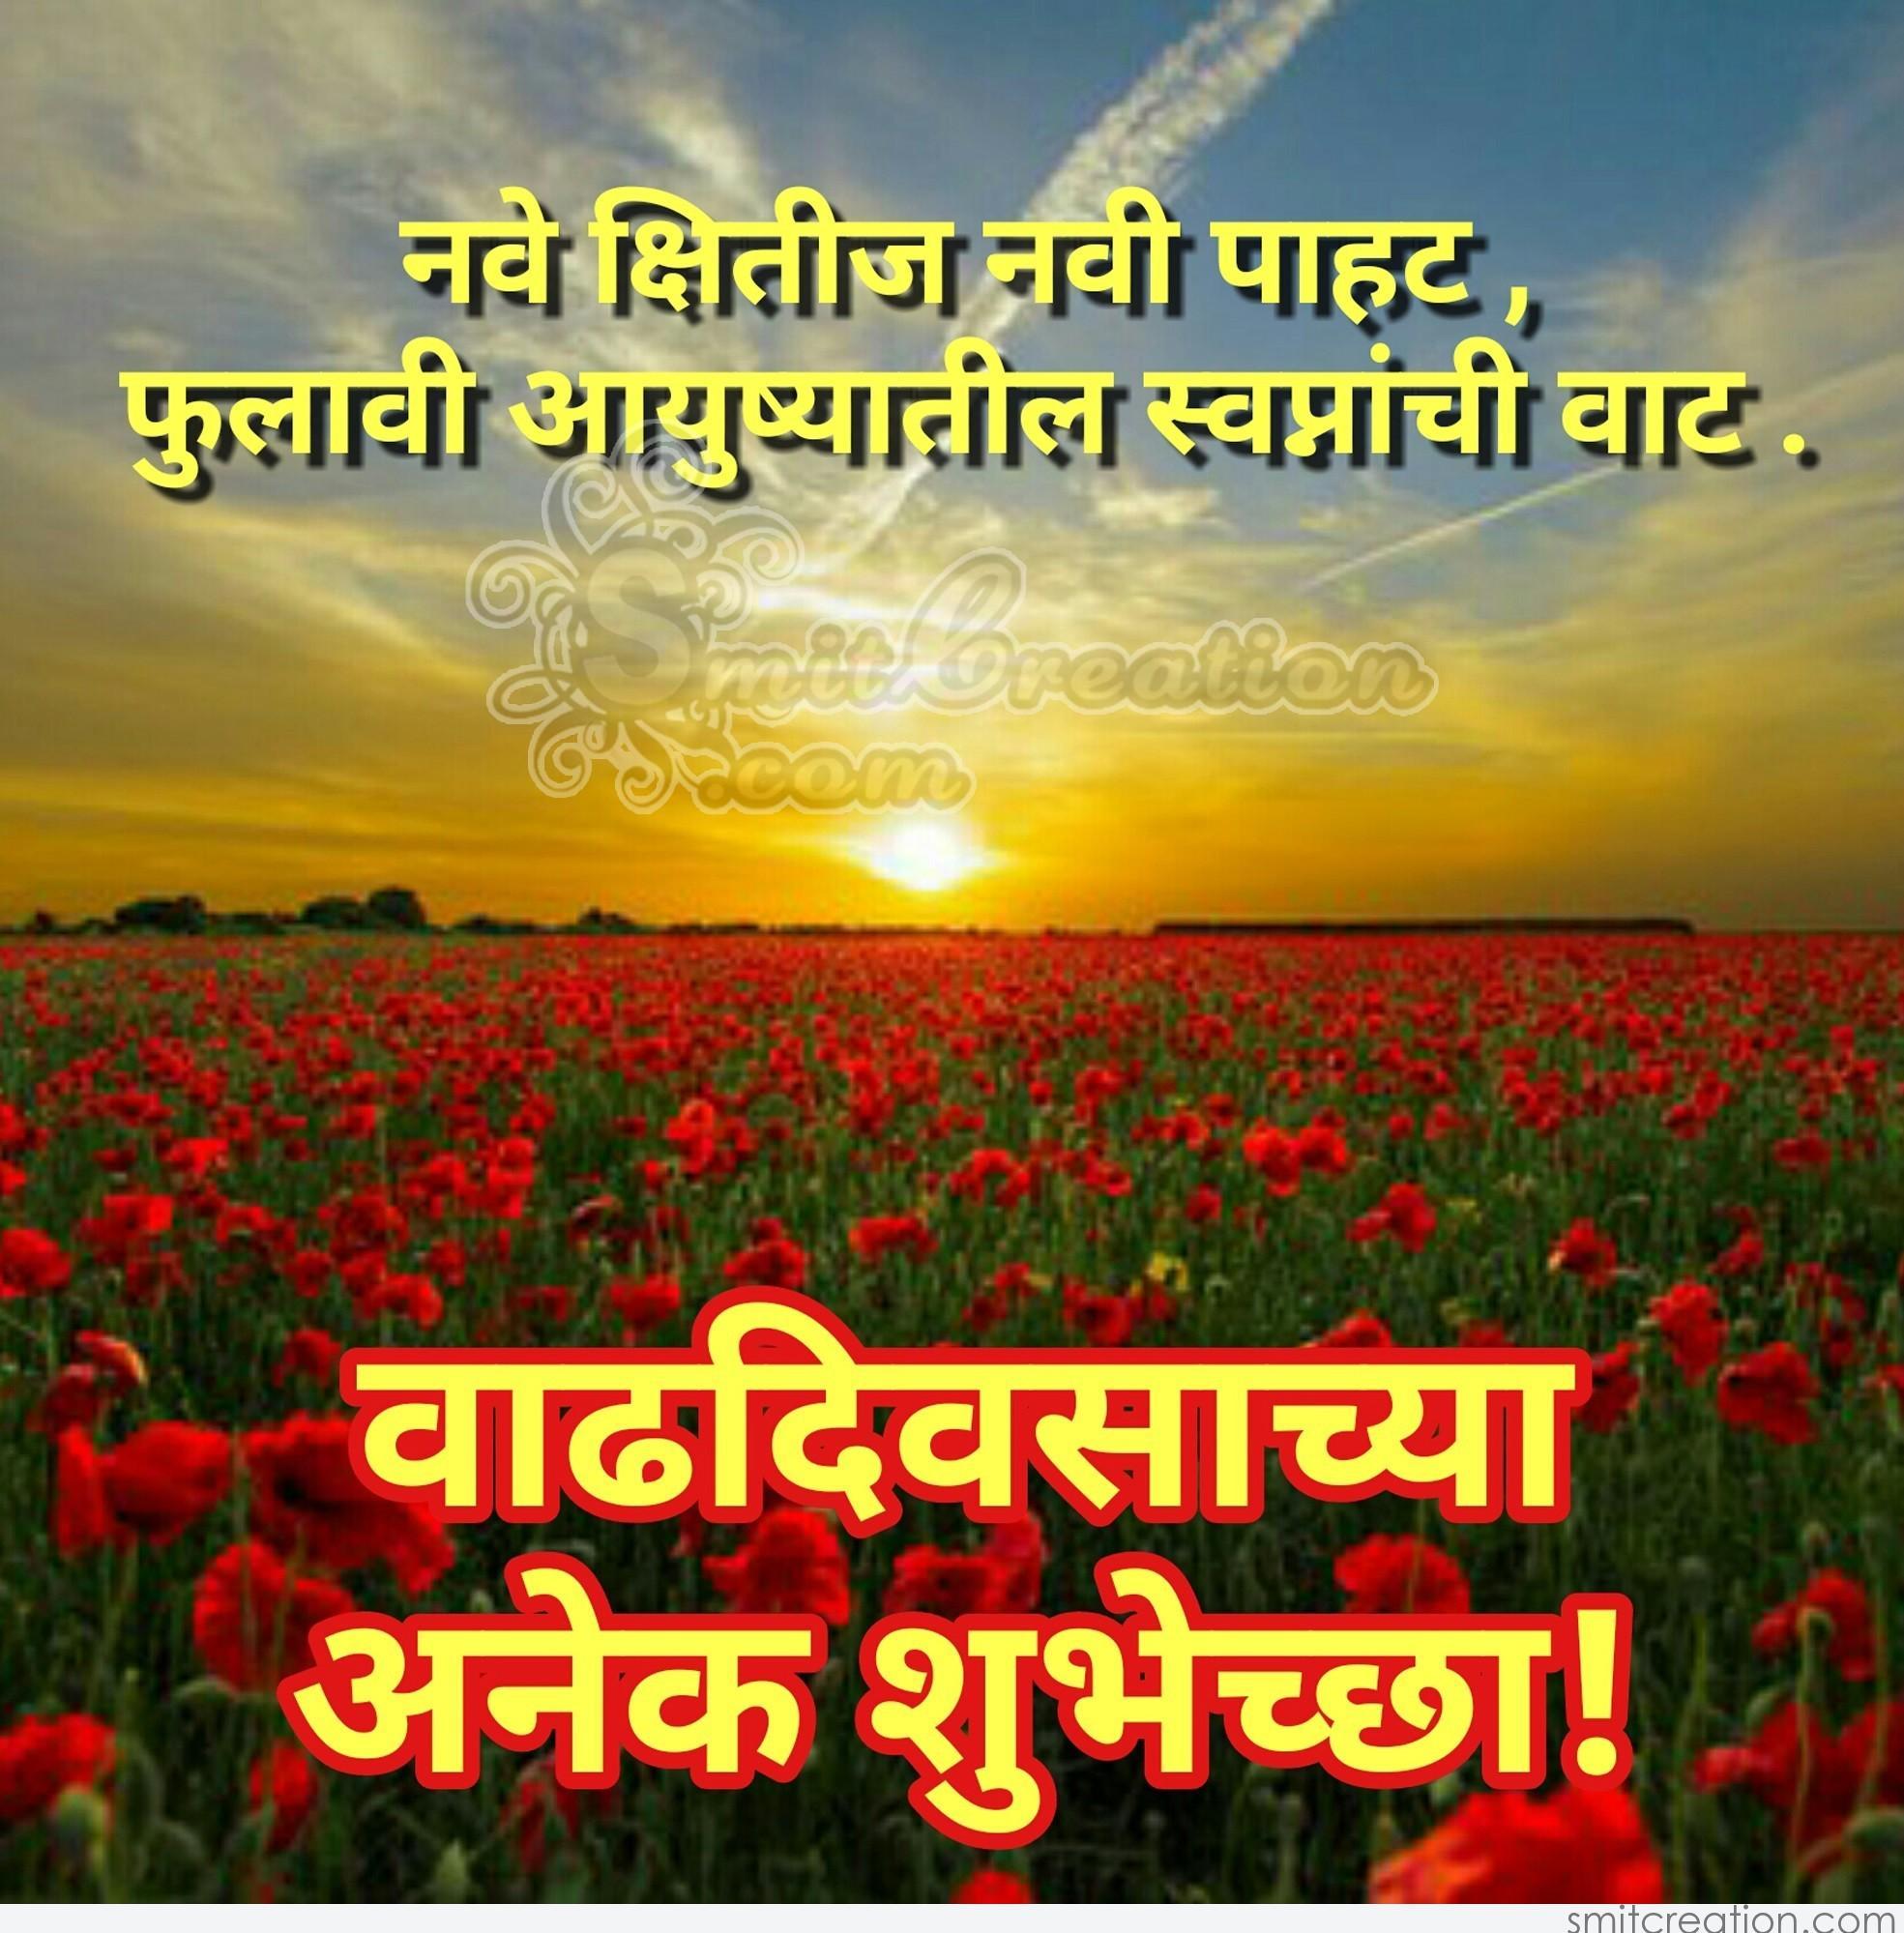 Birthday Marathi Wishes Pictures and Graphics ... Vadhdivas Chya Hardik Shubhechha